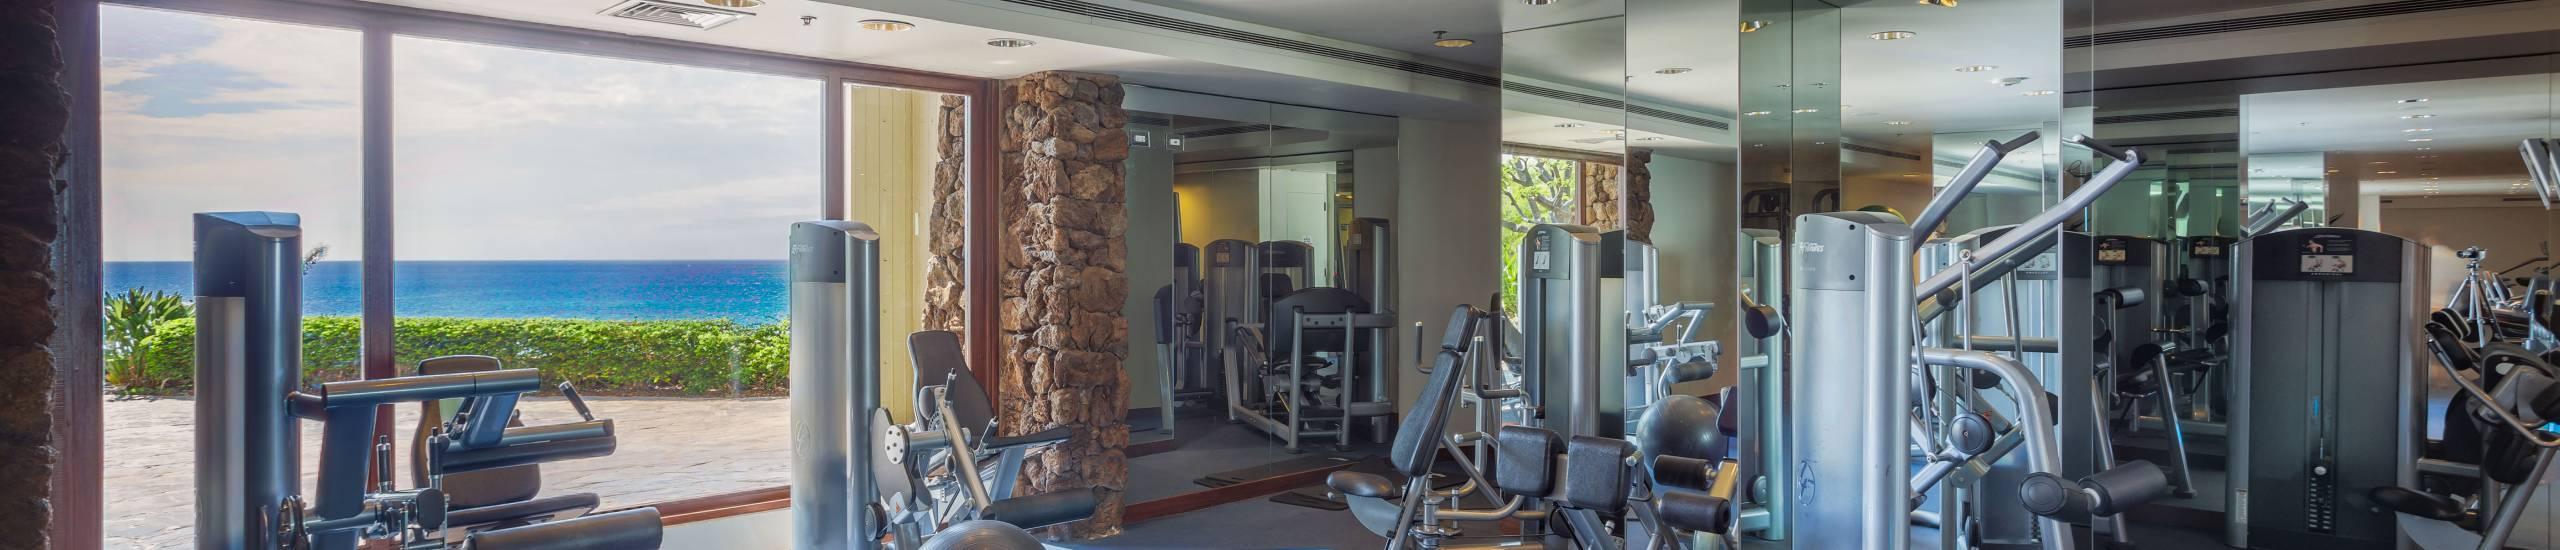 Mauna Kea Resort Fitness Facility